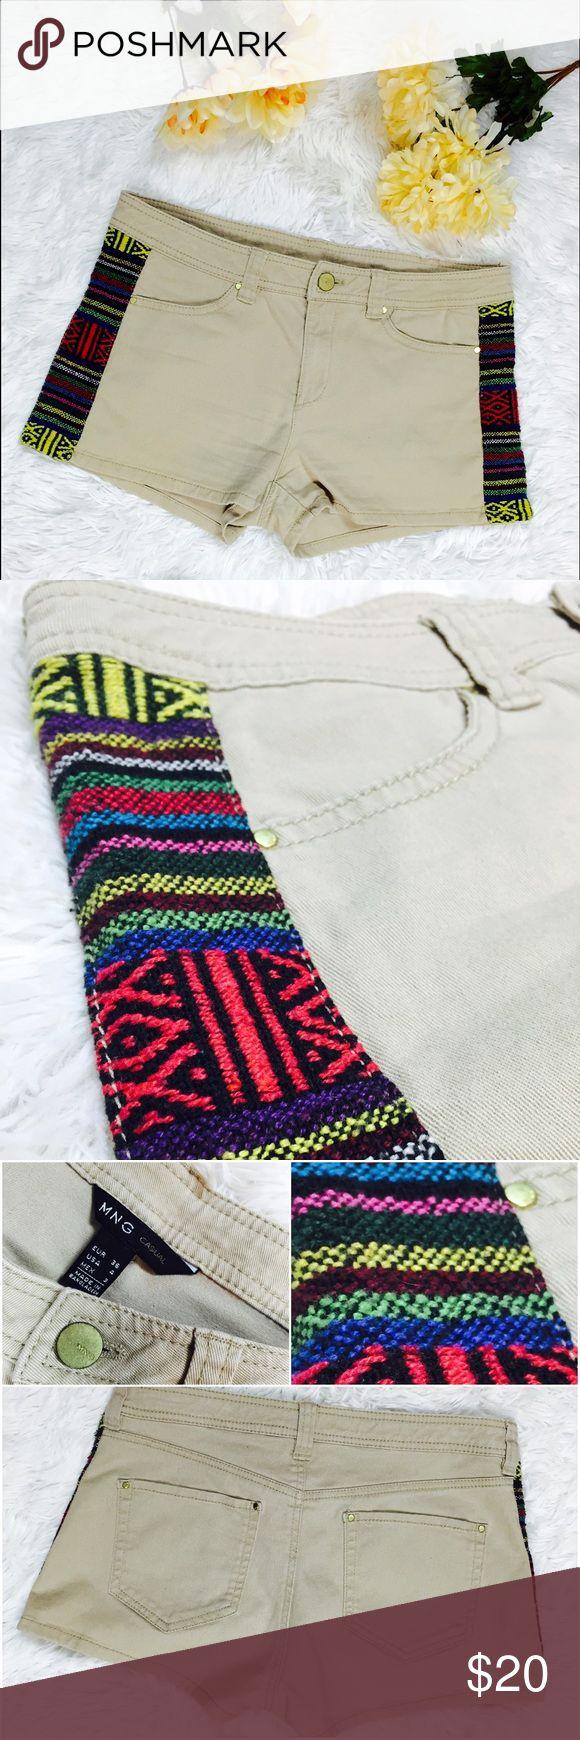 "MNG Basic Khaki Jean Shorts with Latin Woven Panel Stylish boho khaki Jean shorts. Gold tone hardware with logo. Pockets side and back. Exotic Latin print. No stains or tears. Gold tone hardware. Belt loop. MNG Casual. USA 4. Indonesia. No fabric tag. Length: 9.5"" Inseam: 2"" Waist: 14.5"". Size chart: Waist: 26"" Mango Shorts"